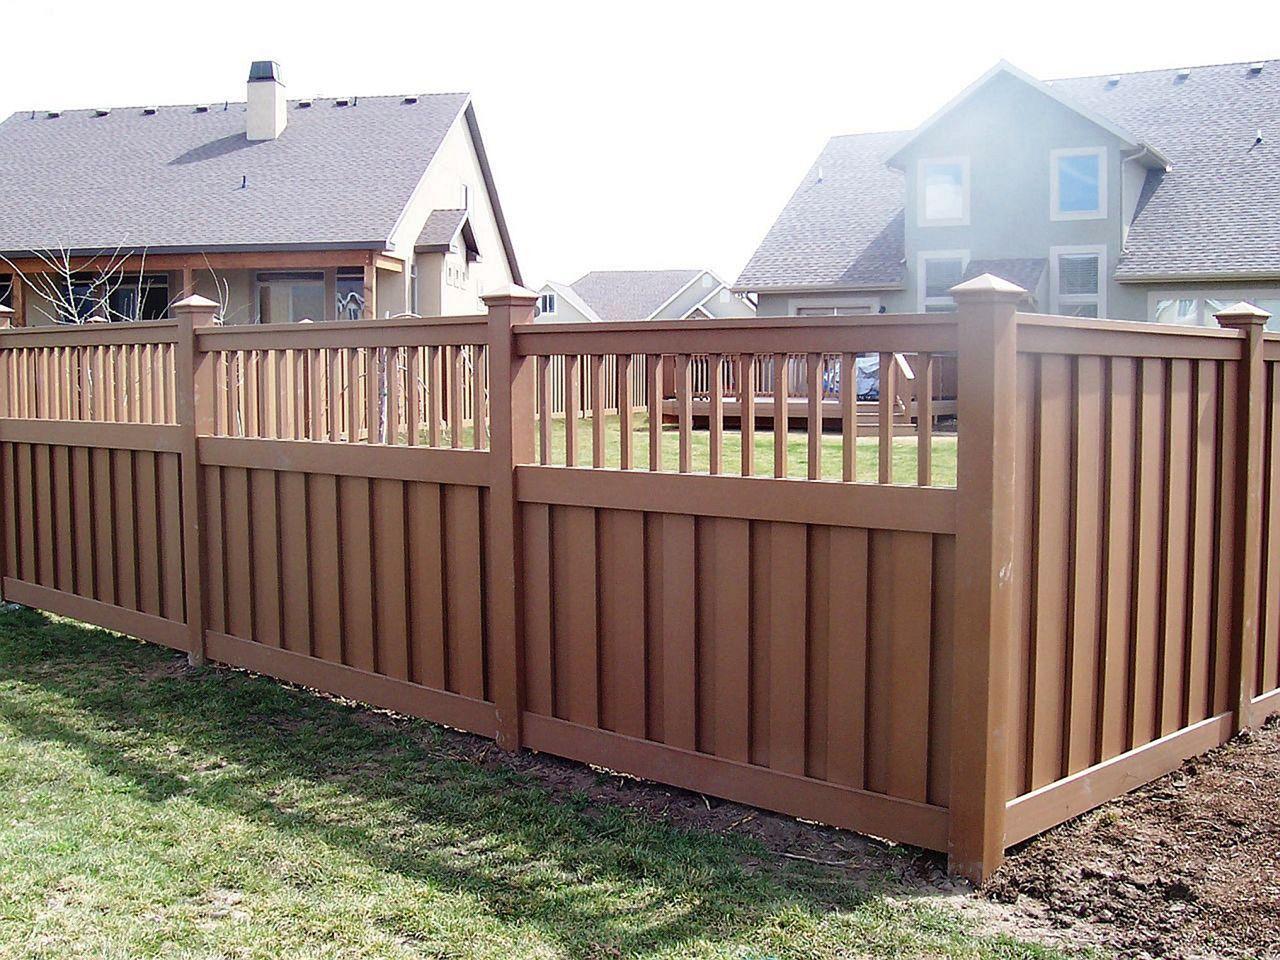 Flawless 56 Cheap Diy Fence Ideas For Your Beautiful Garden Https Decoredo Com 6804 56 Cheap Diy Fence Ideas Wood Fence Design Fence Design Backyard Fences